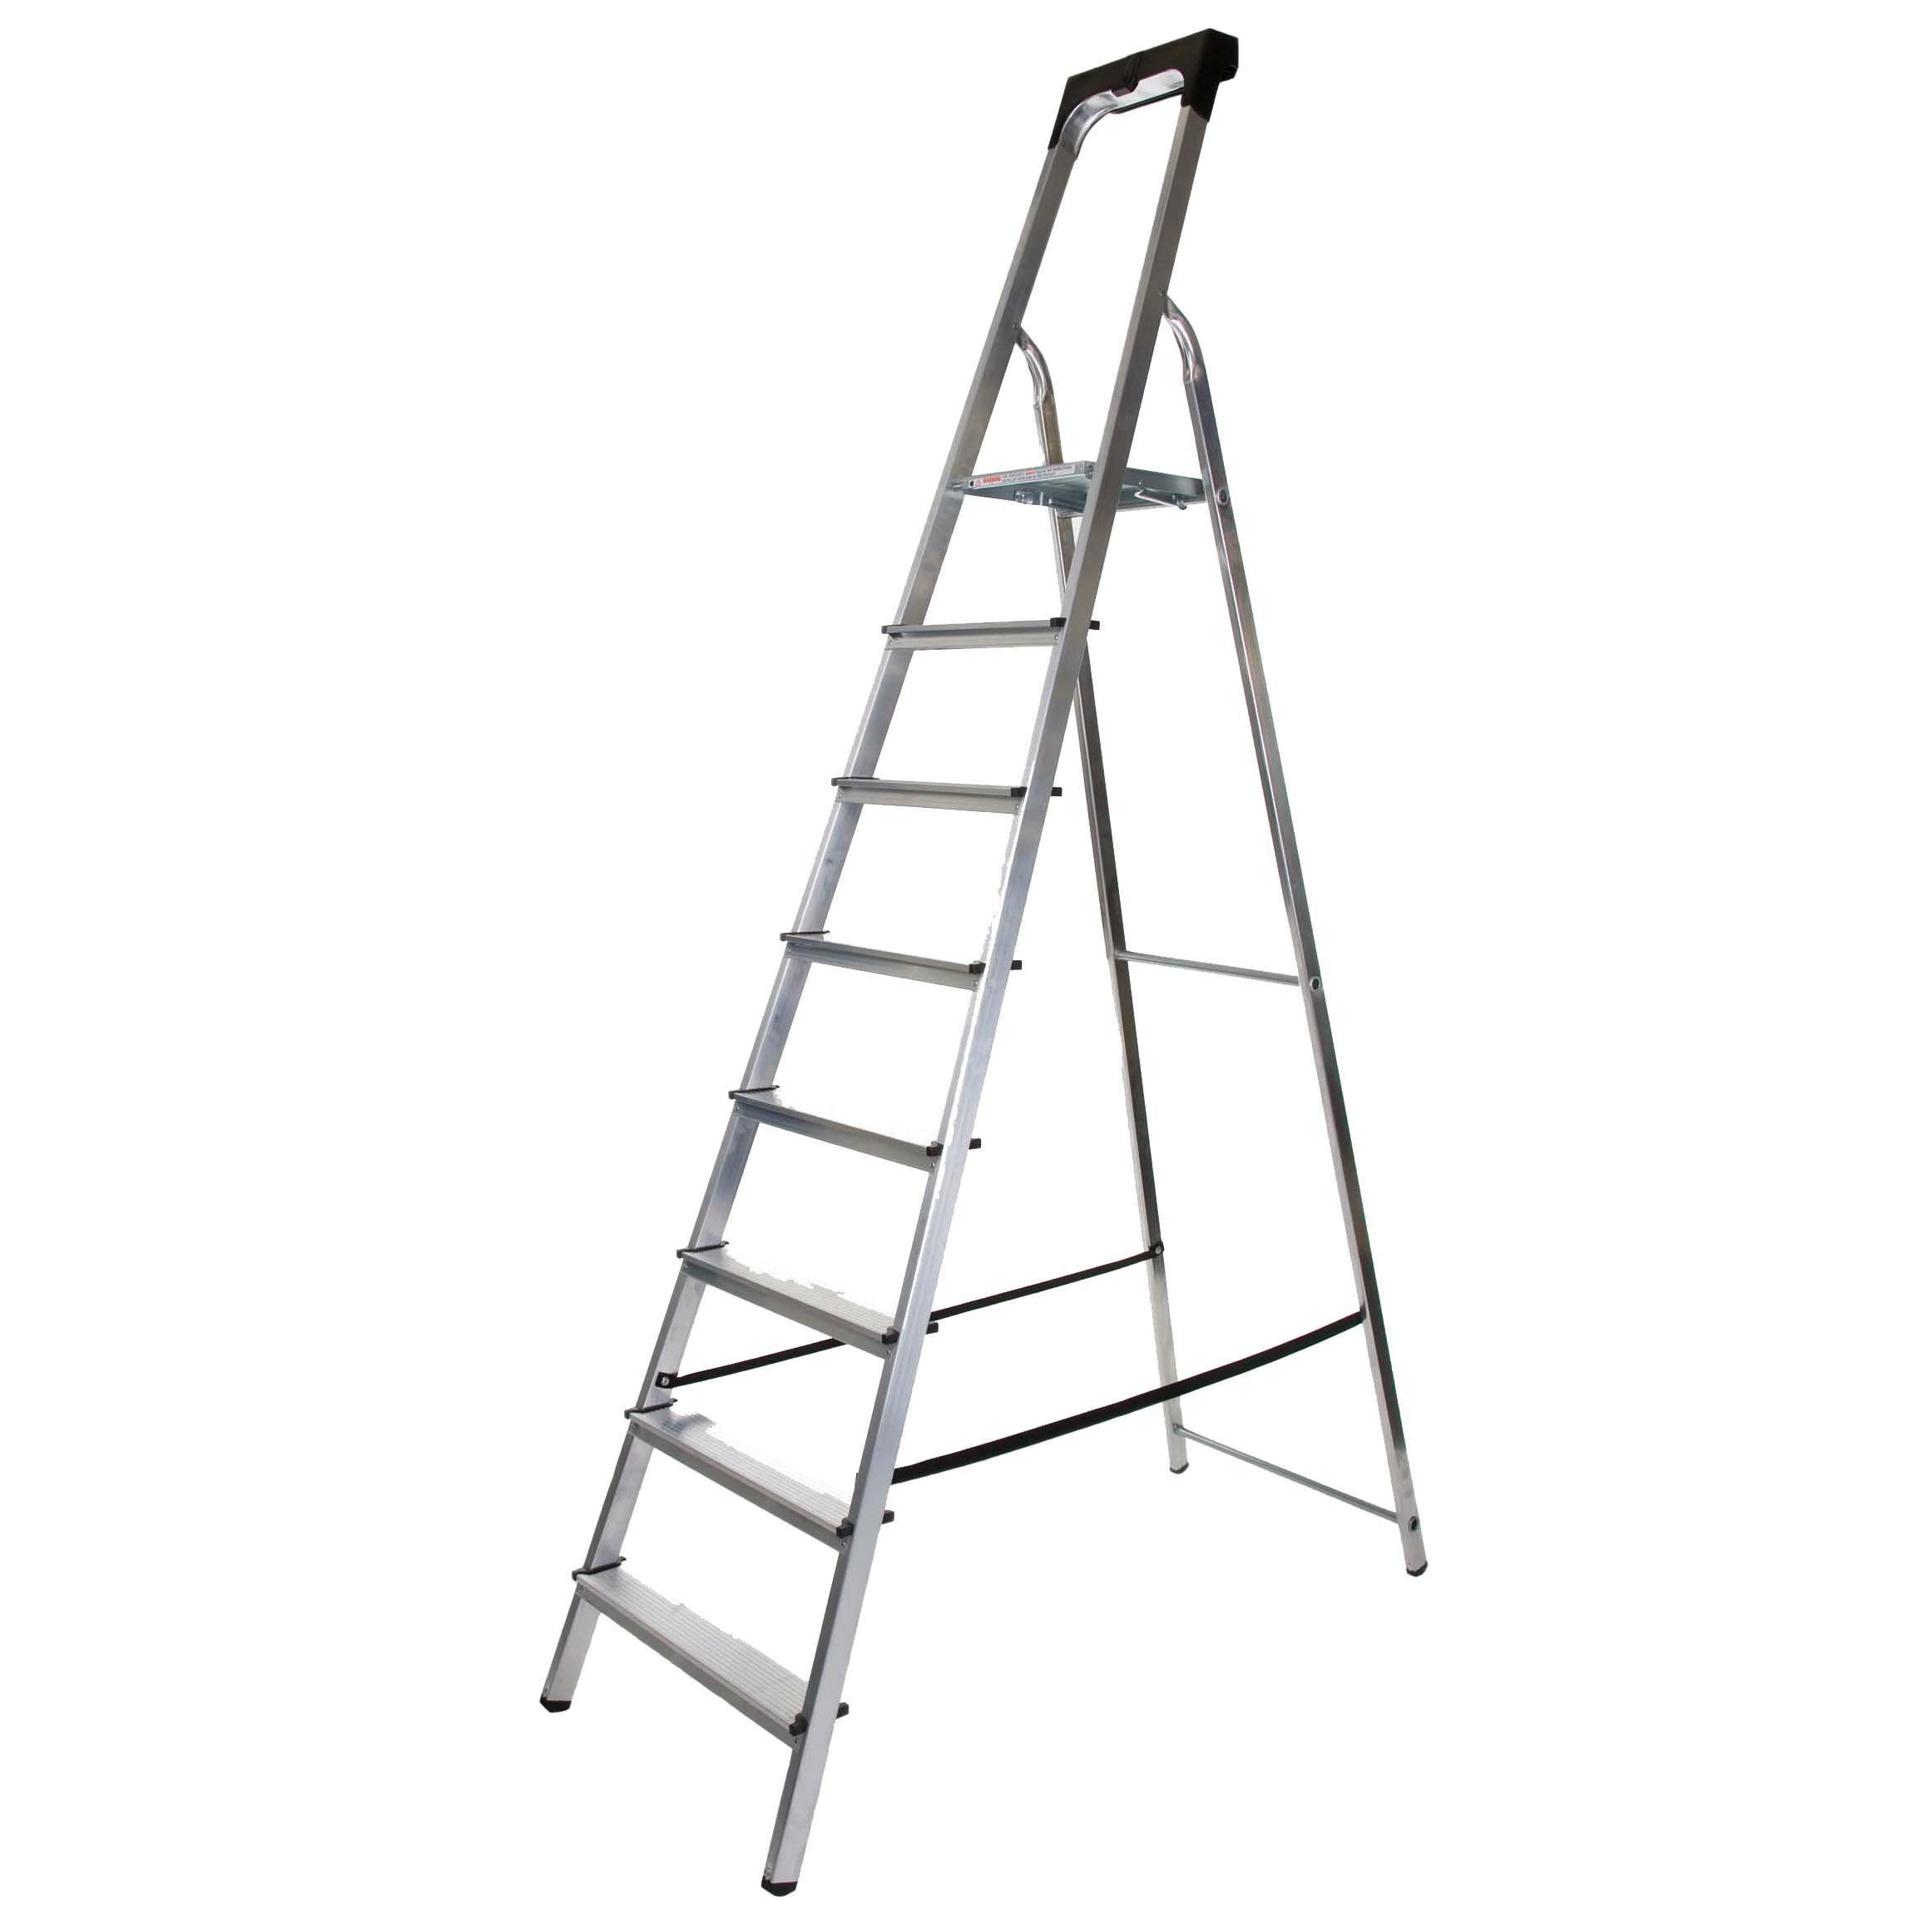 Werner 8 Tread Aluminium Platform Stepladder, 2.3m